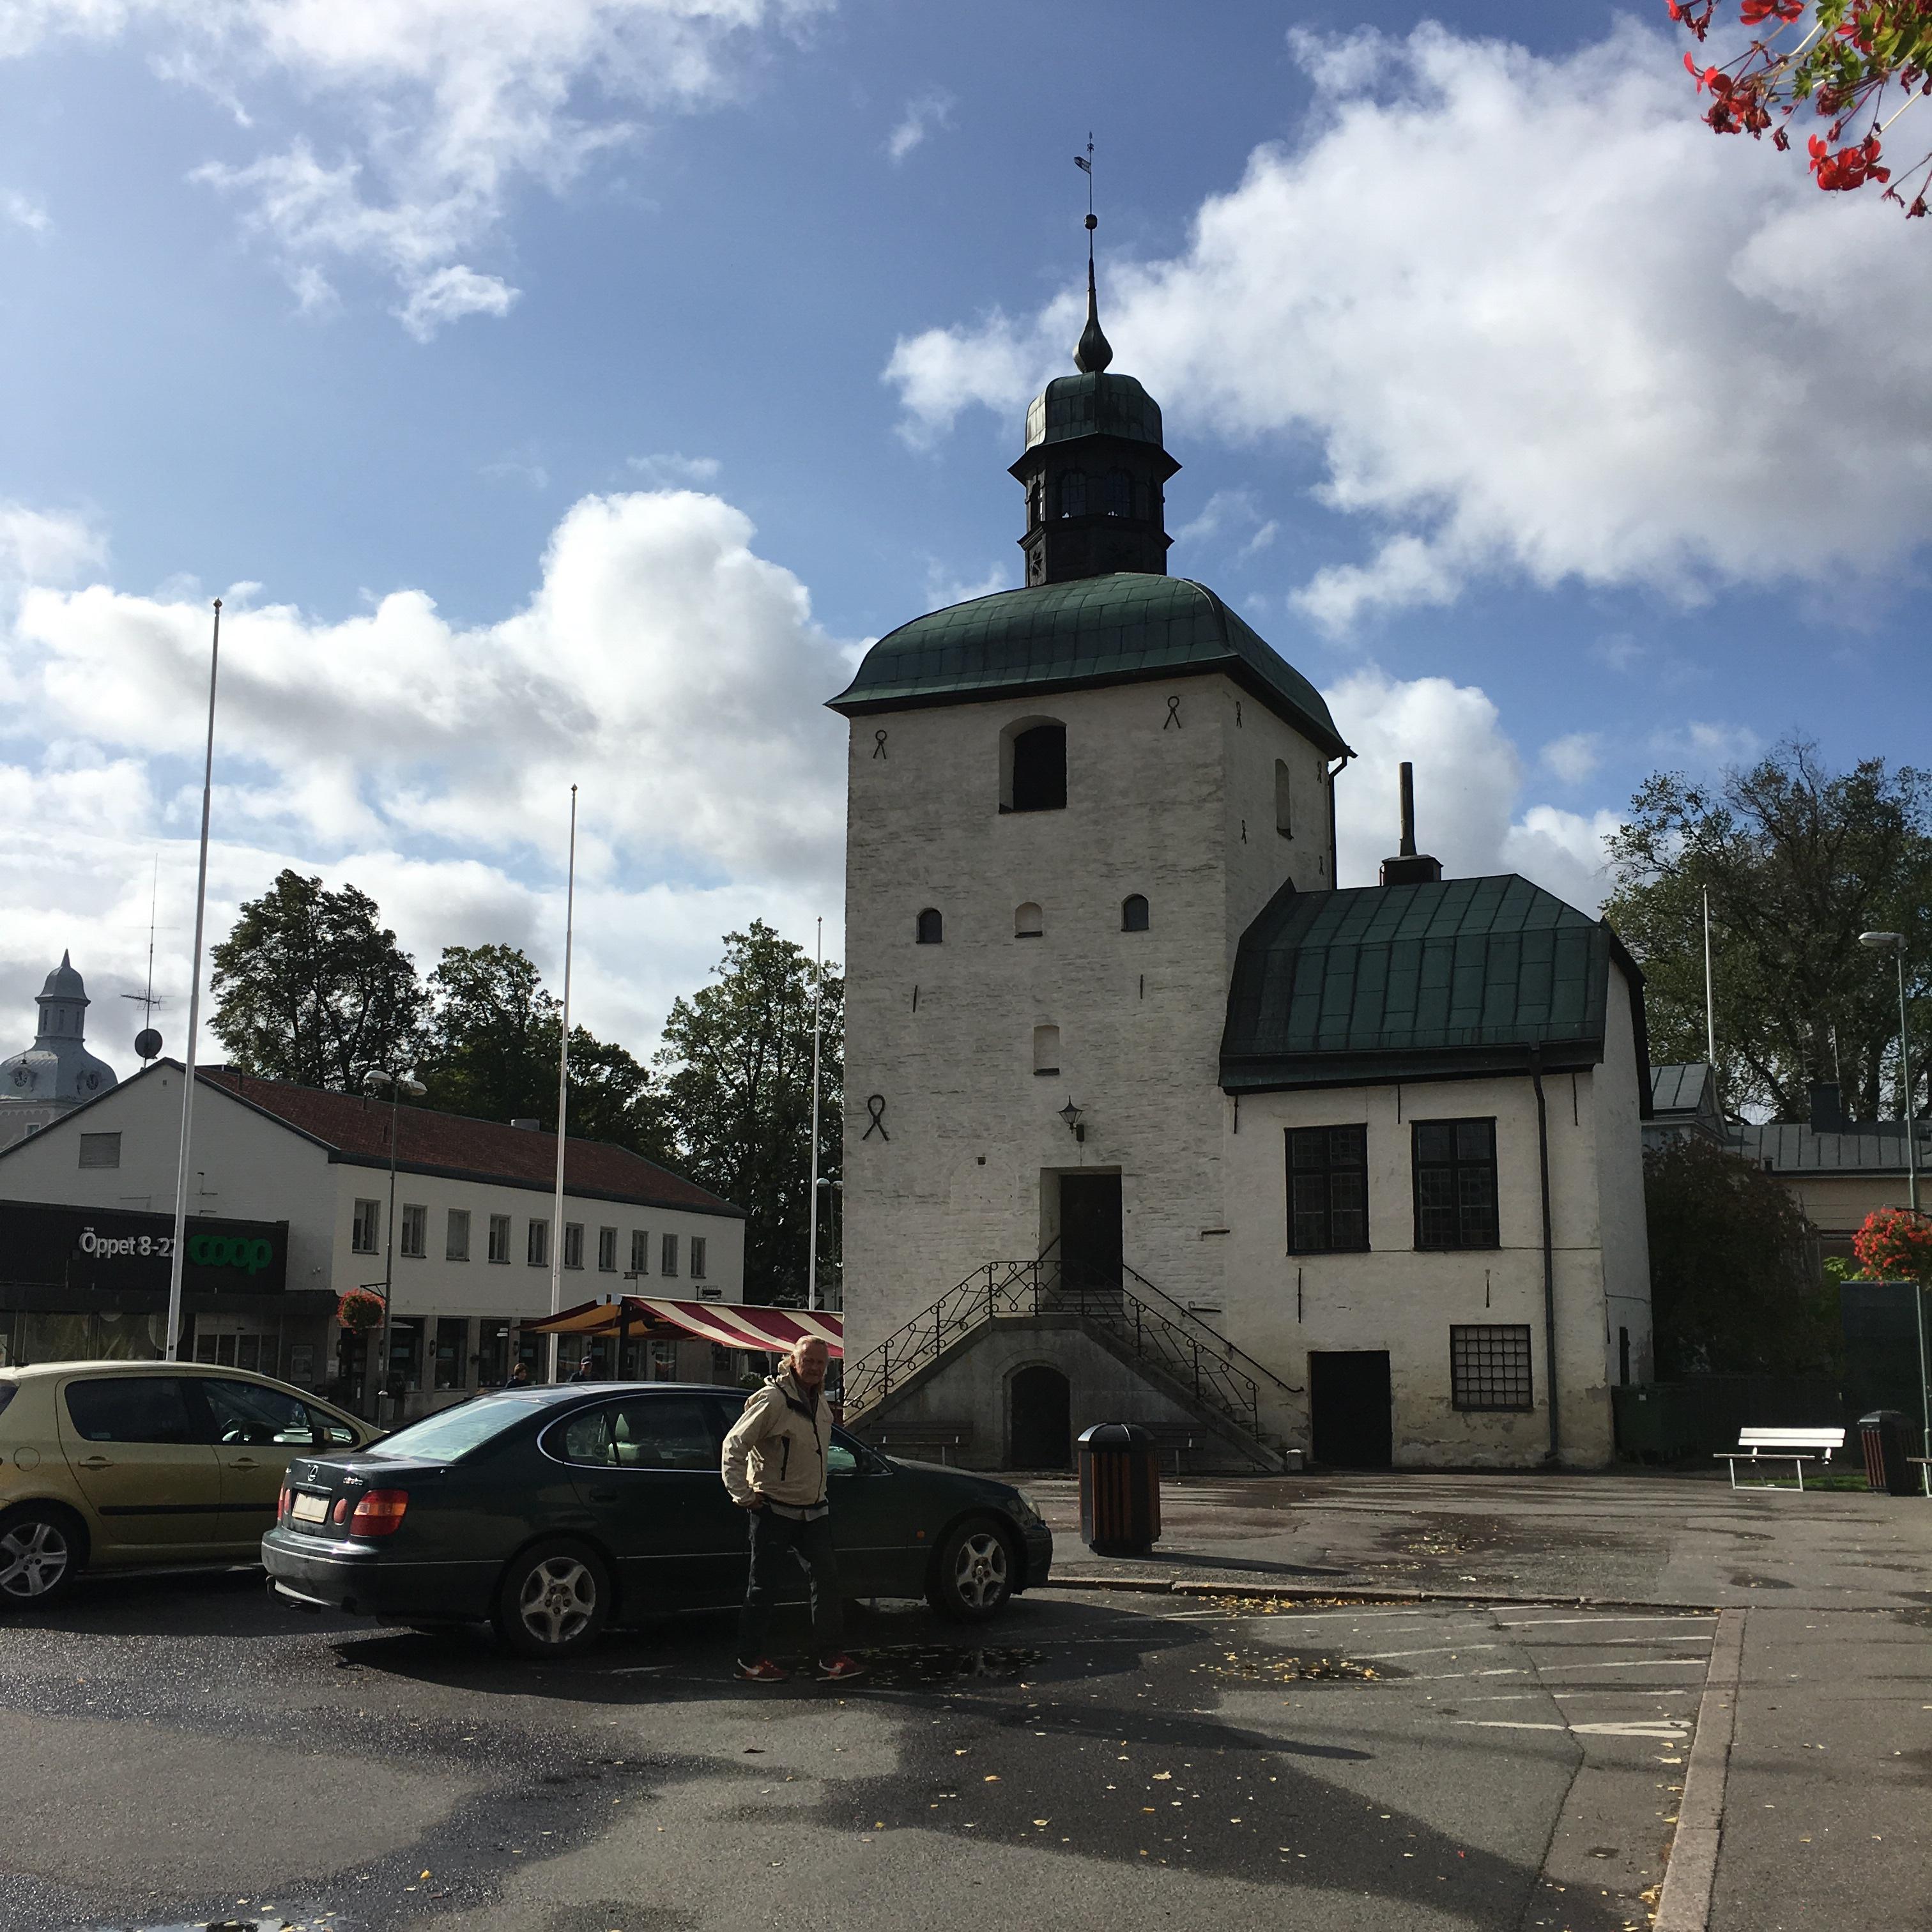 Lilla Torget, Vadstena